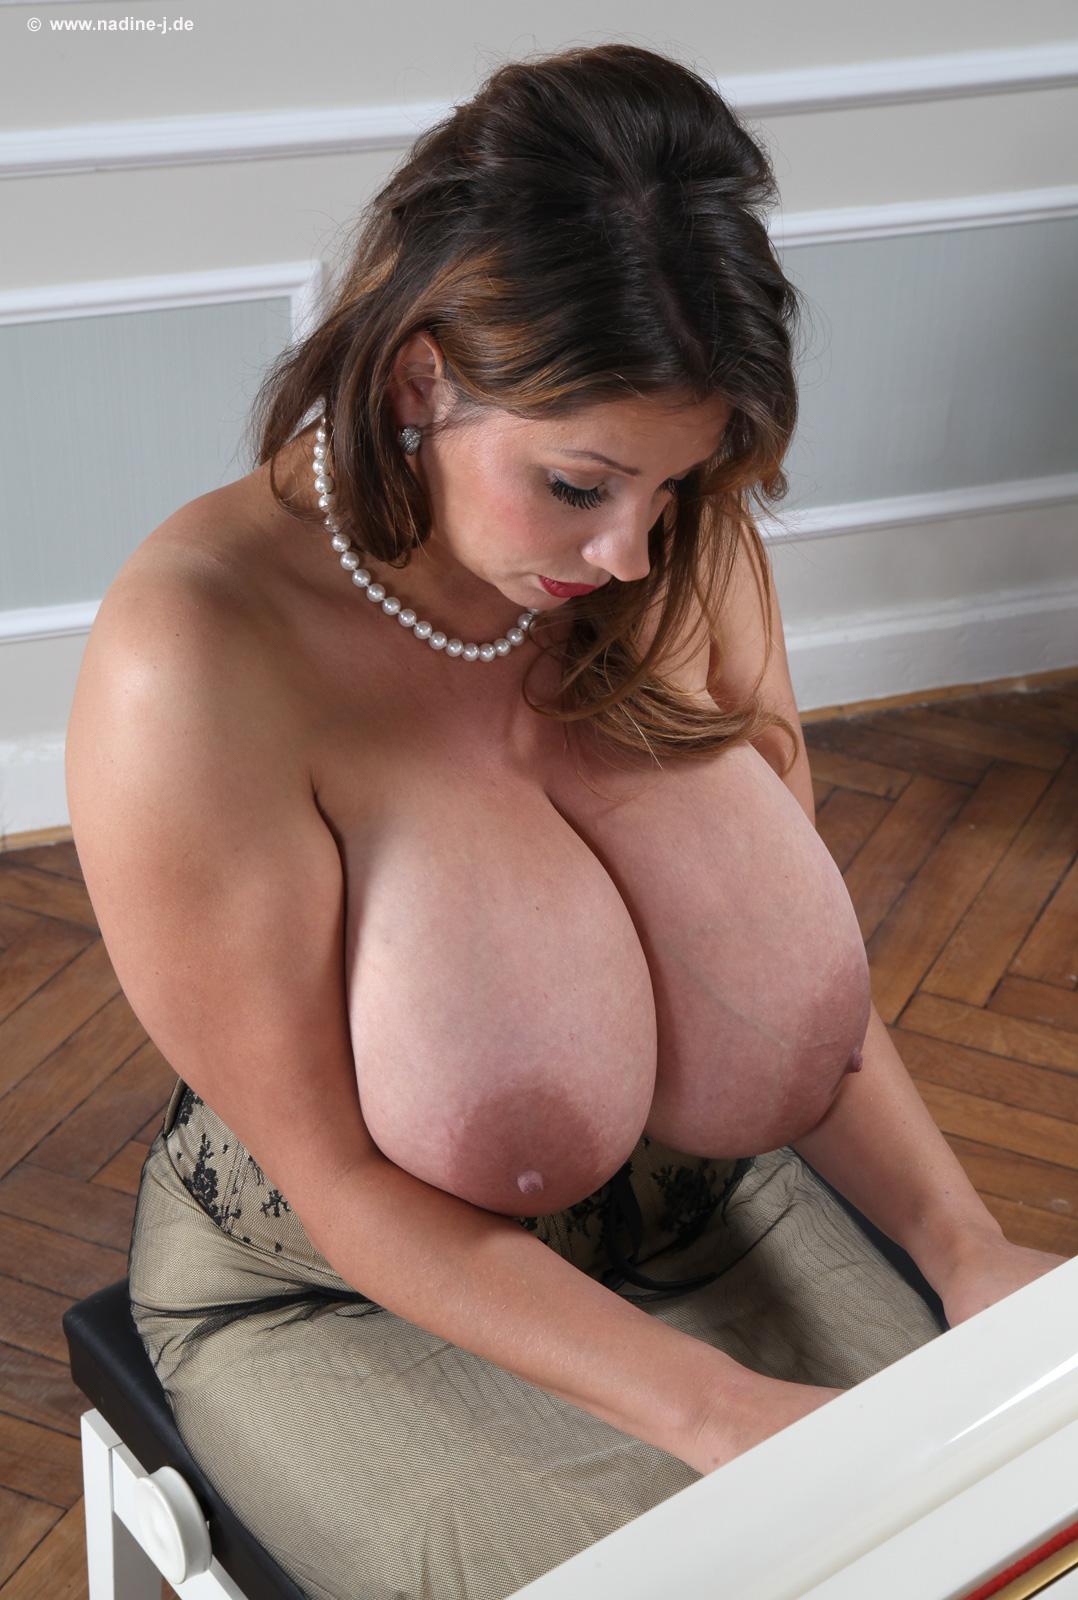 worls hotest girl boob